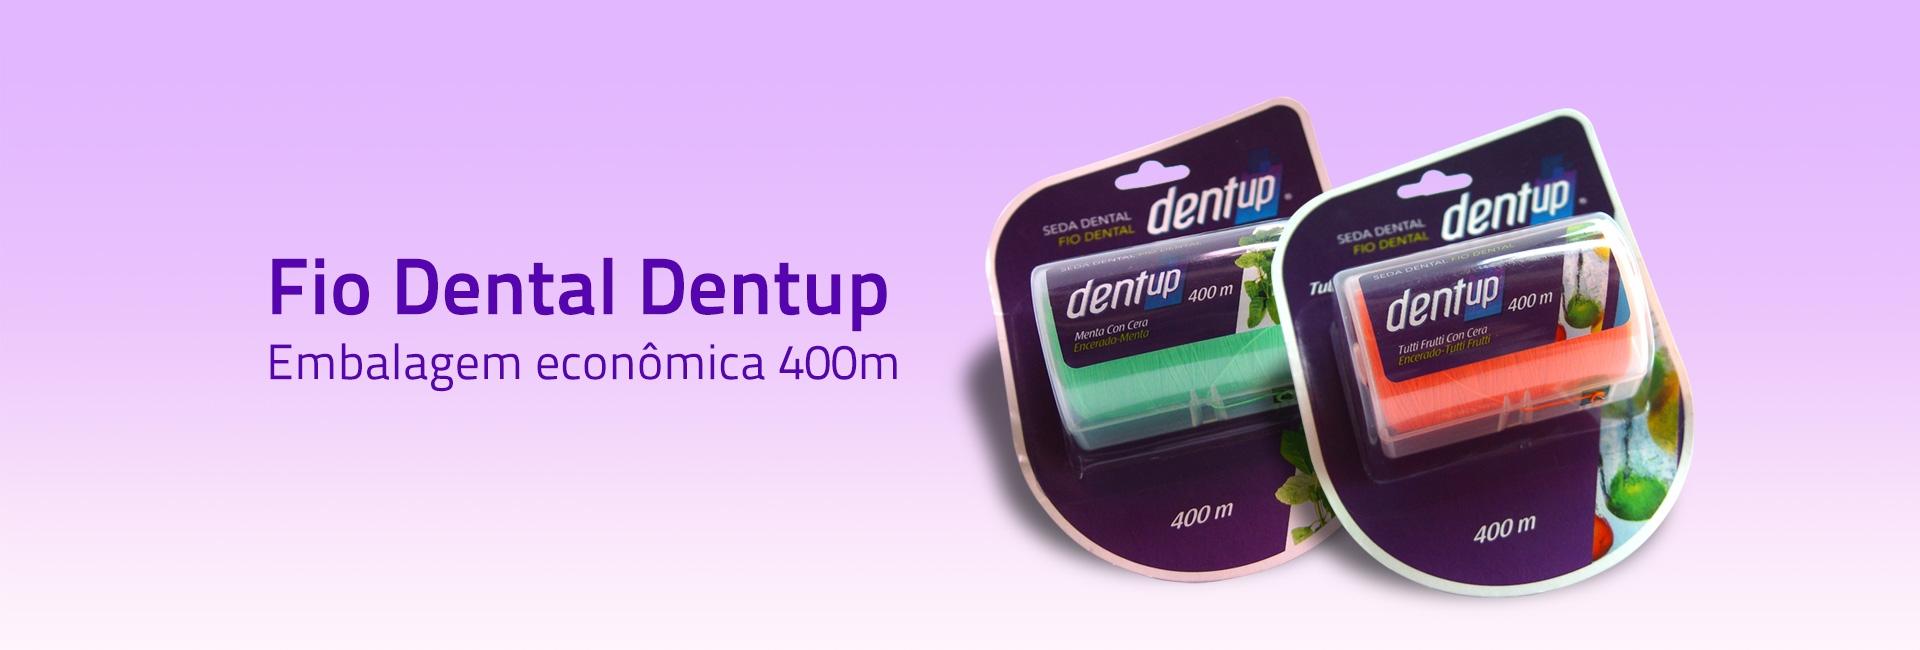 Fio Dental | 400m